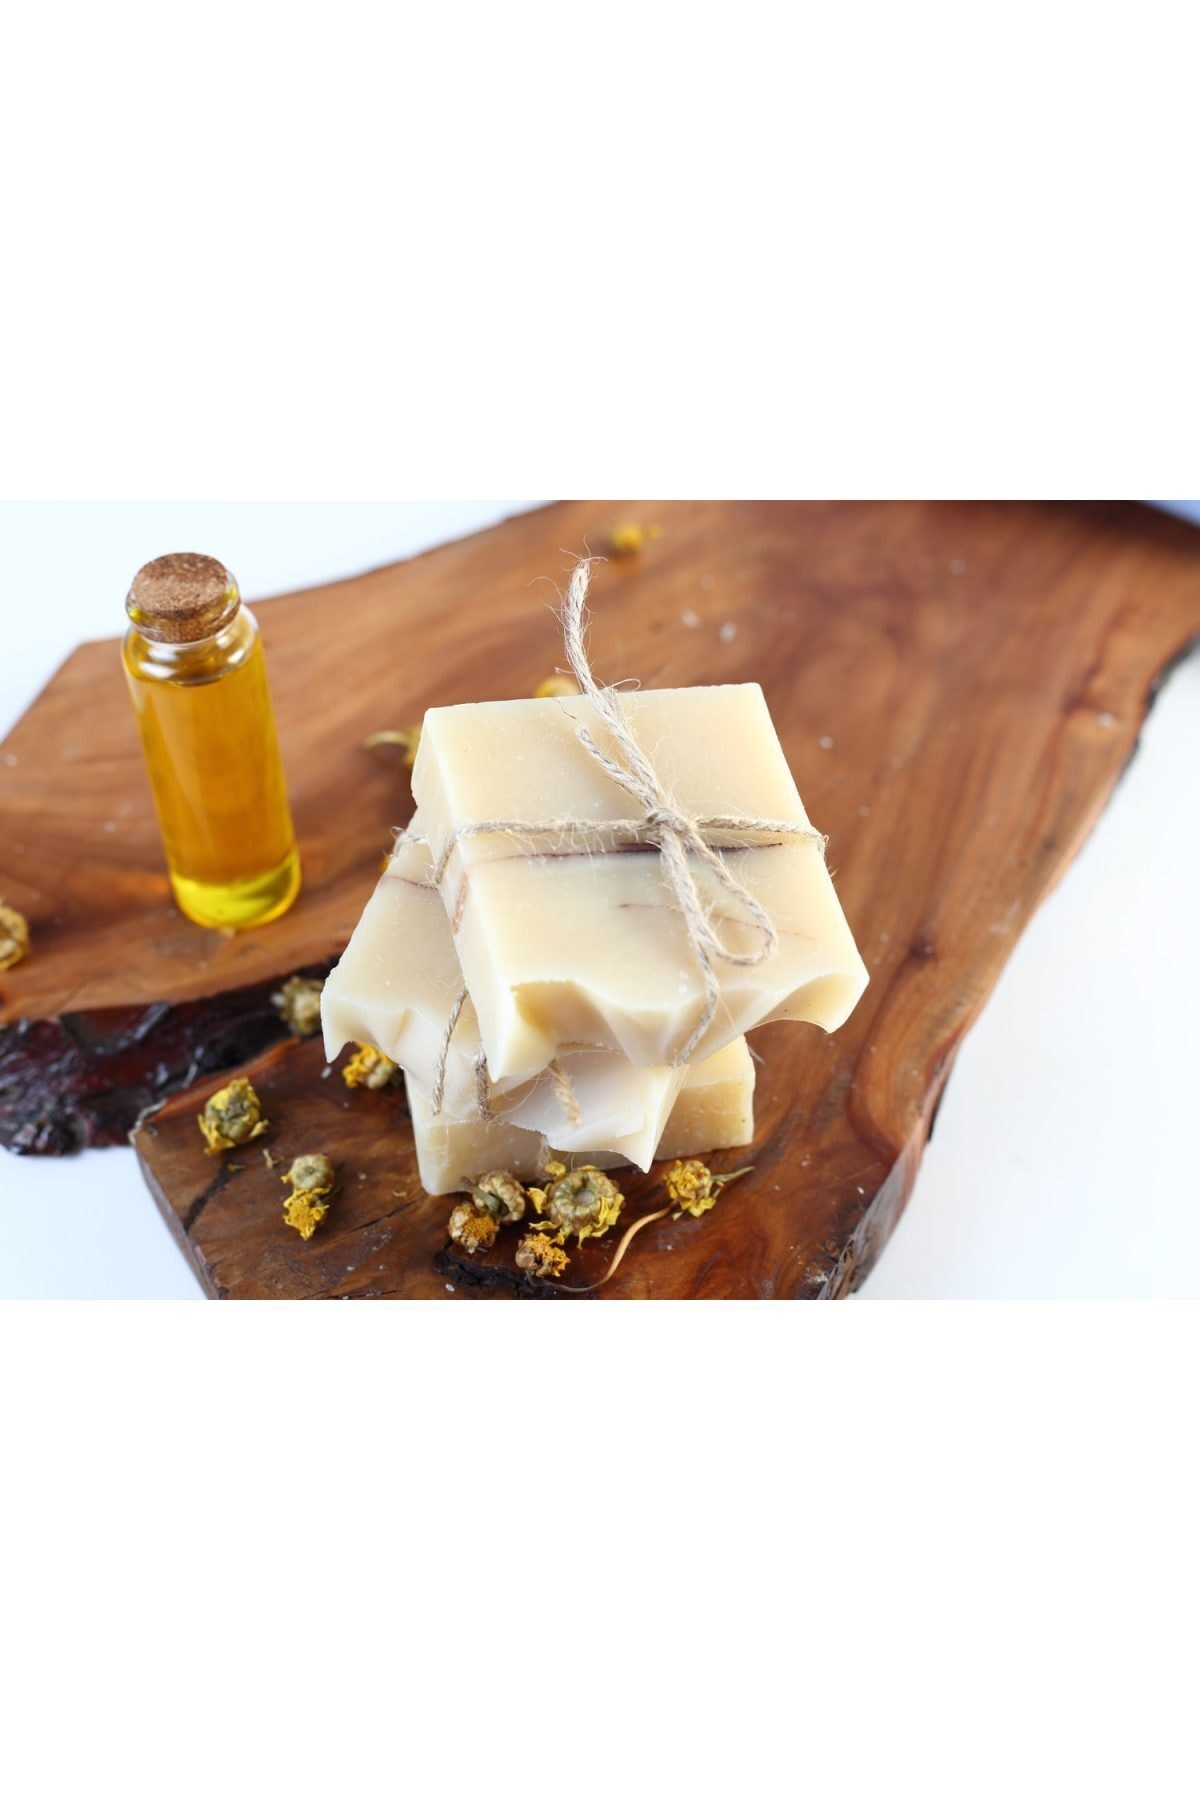 Hygieia Organik El Yapımı Shea Sabunu 100 gr 2 Adet